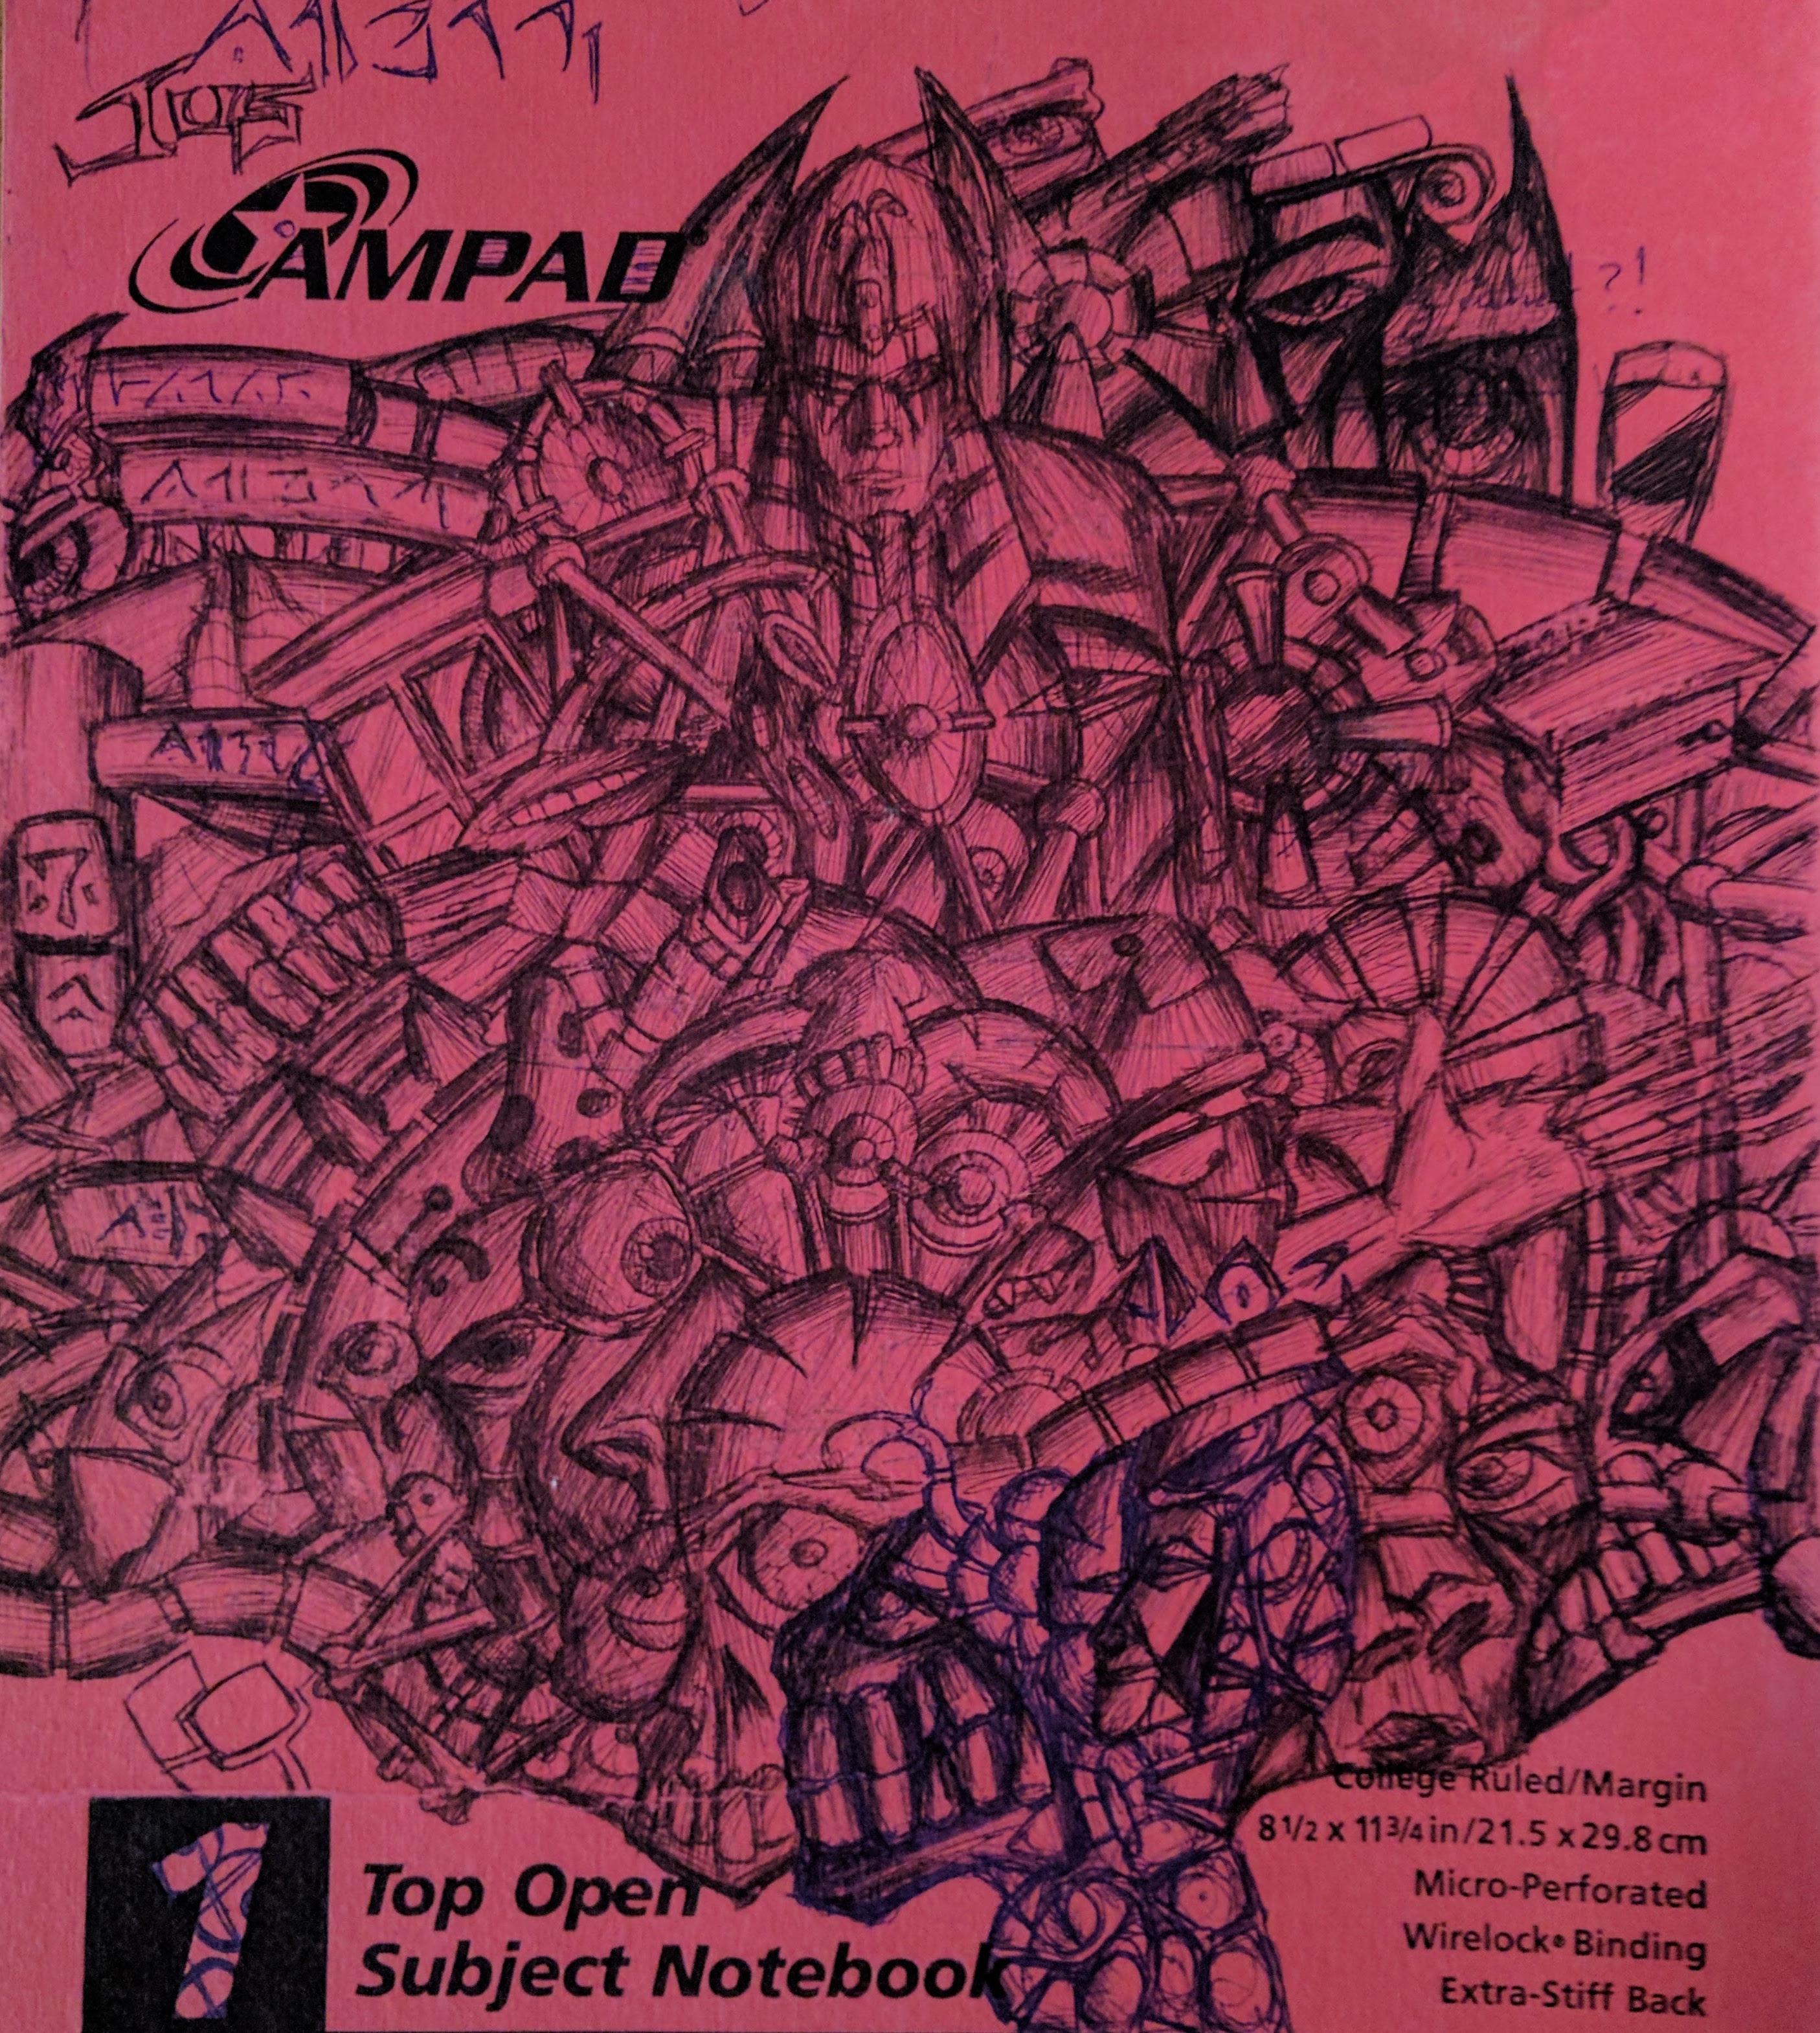 Random Doodling (circa 1990s)